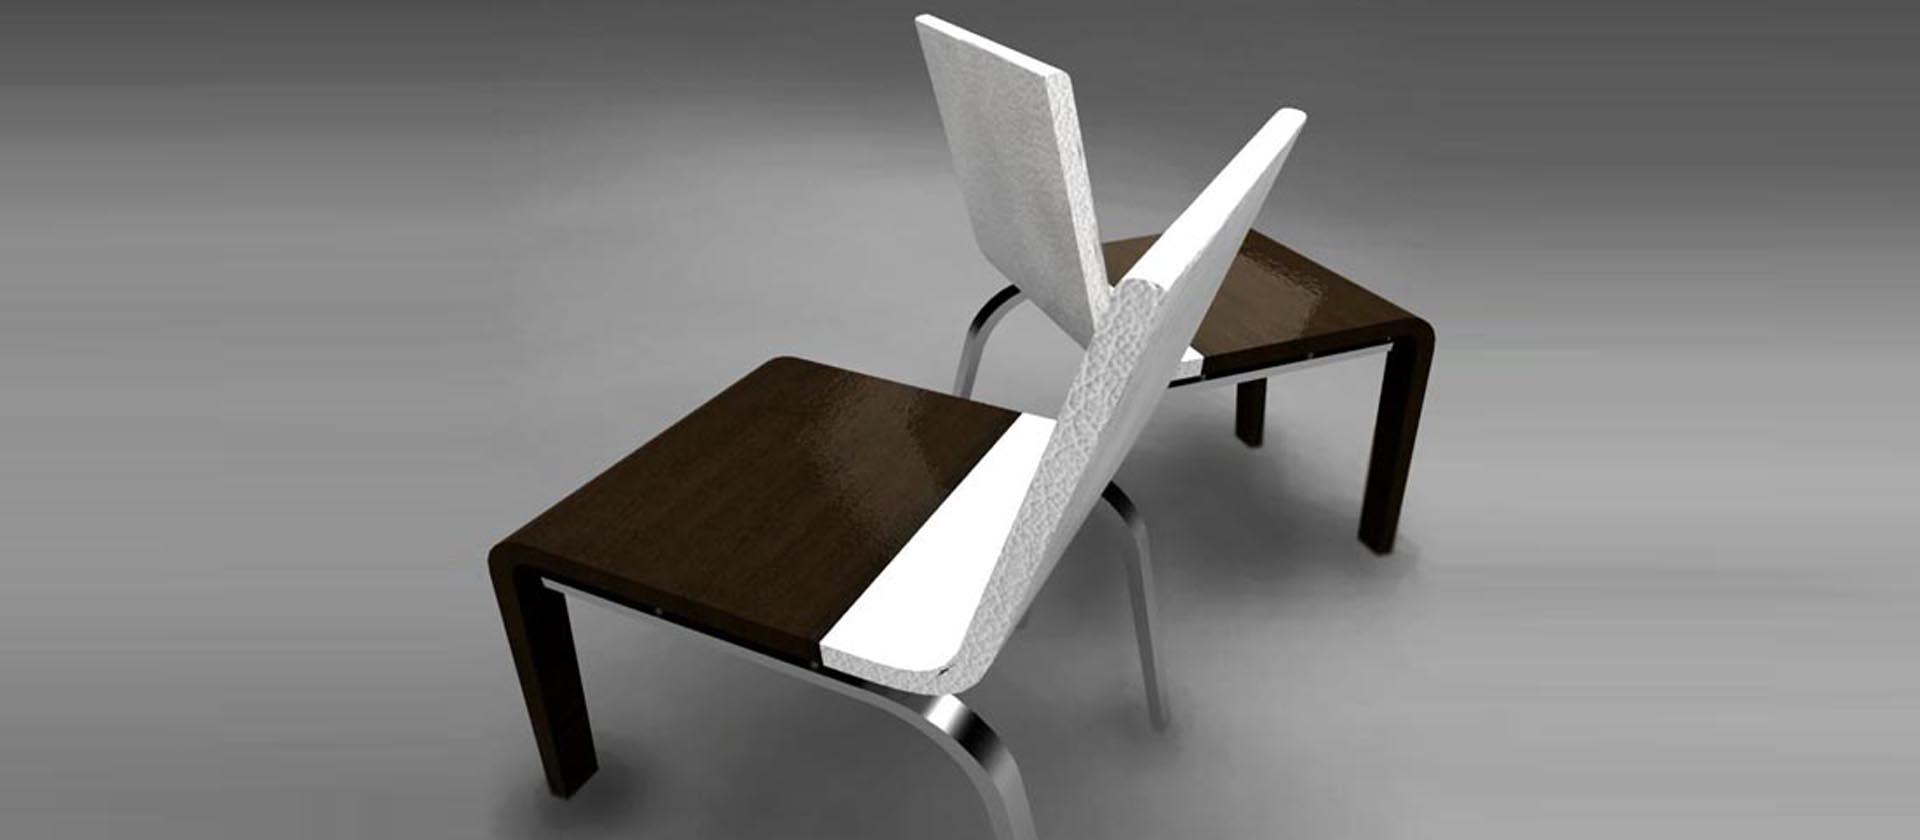 furniture design photo. Furniture Design Master In Italy : FIDI Of Funiture Florence Photo U